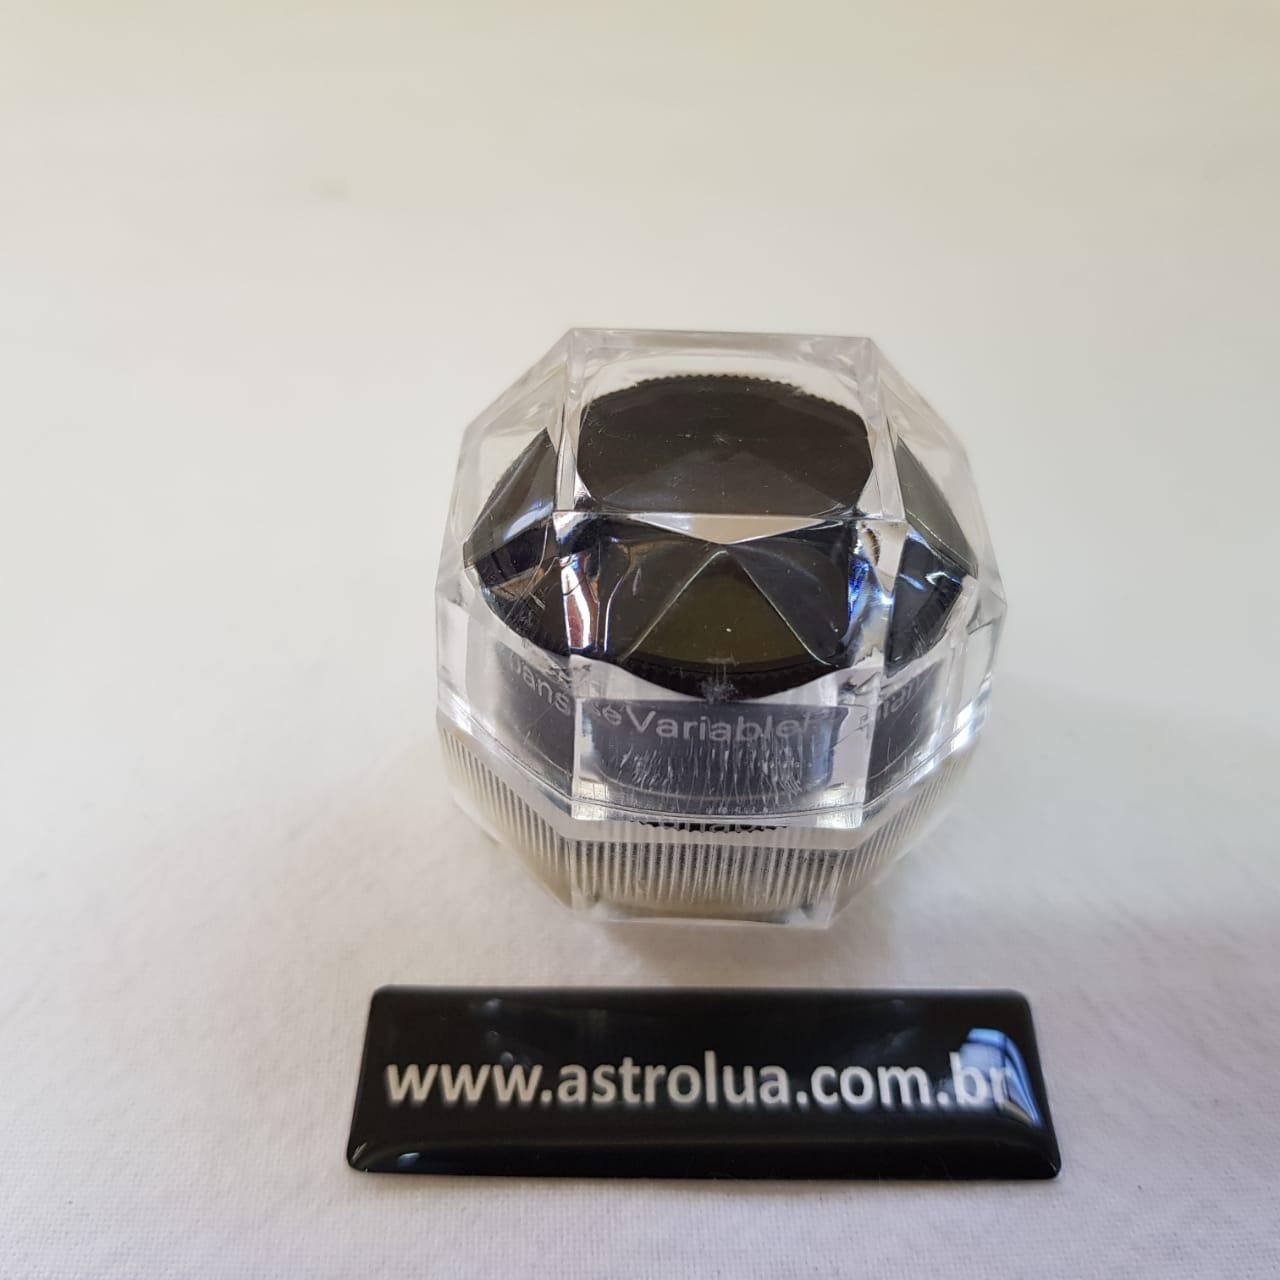 "Filtro 1,25"" - Polarizador Variável #3 - Duas Peças - EXPANSE"